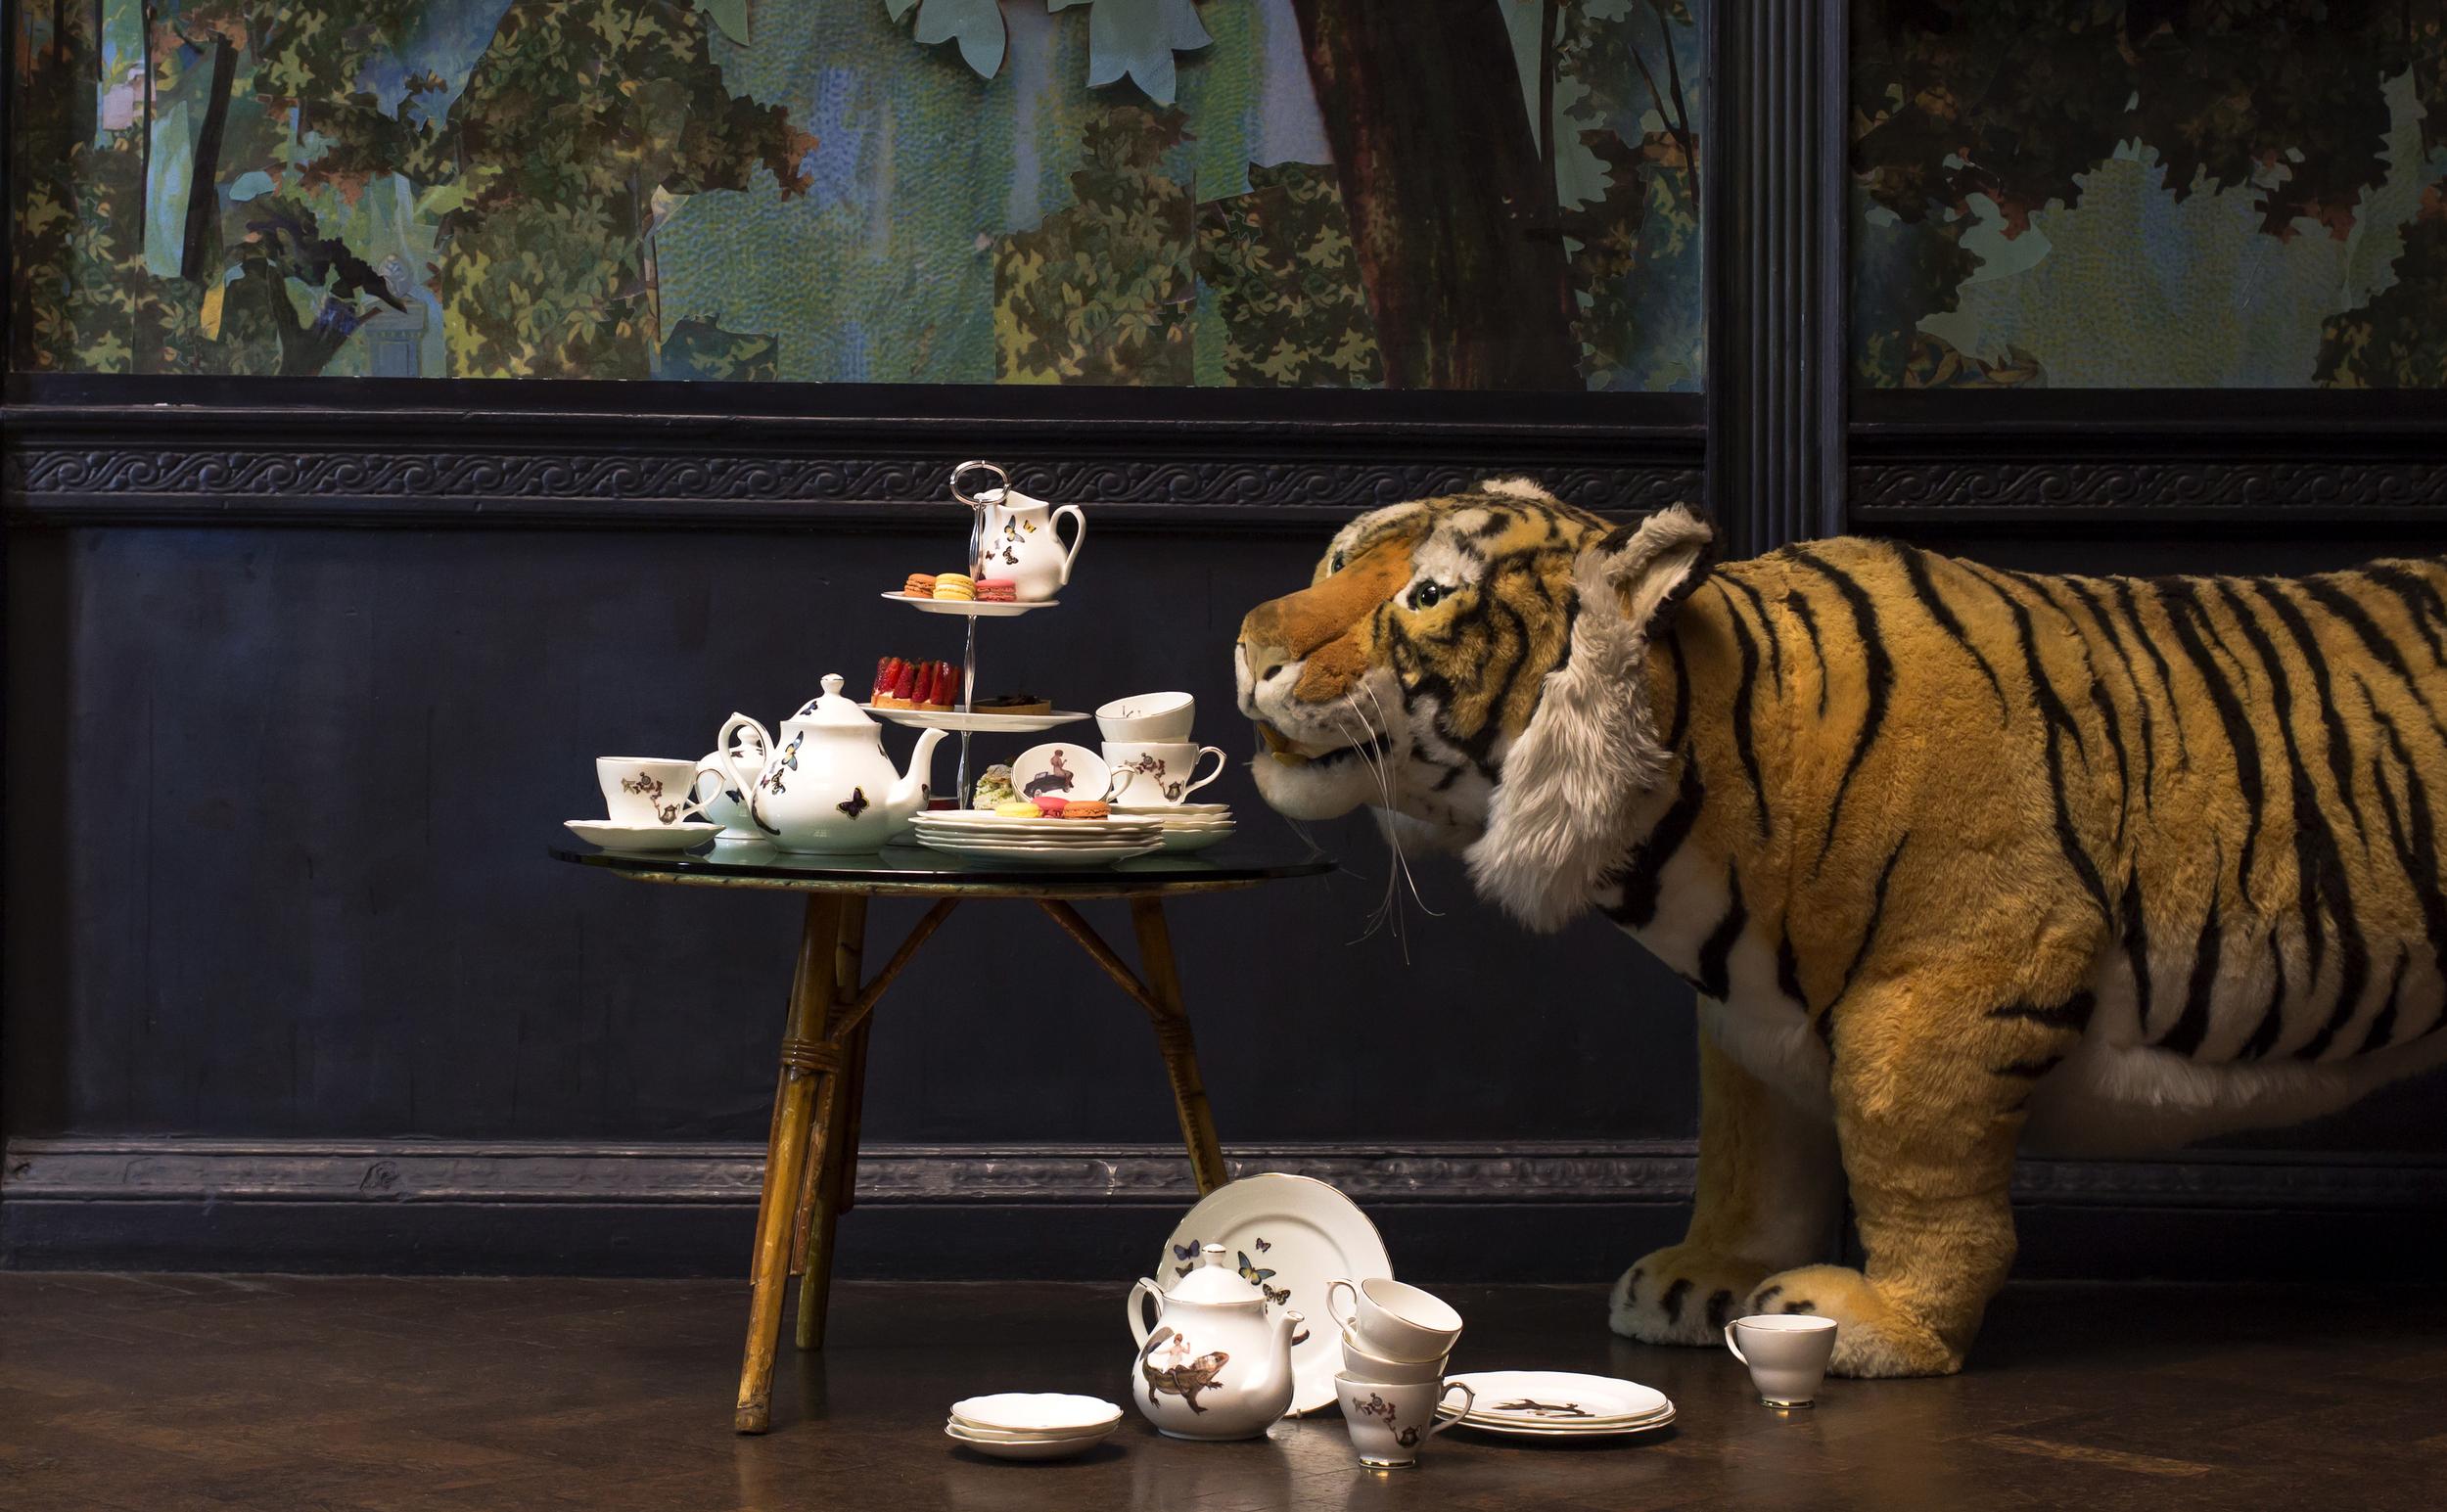 Ali Miller & a Steiff tiger